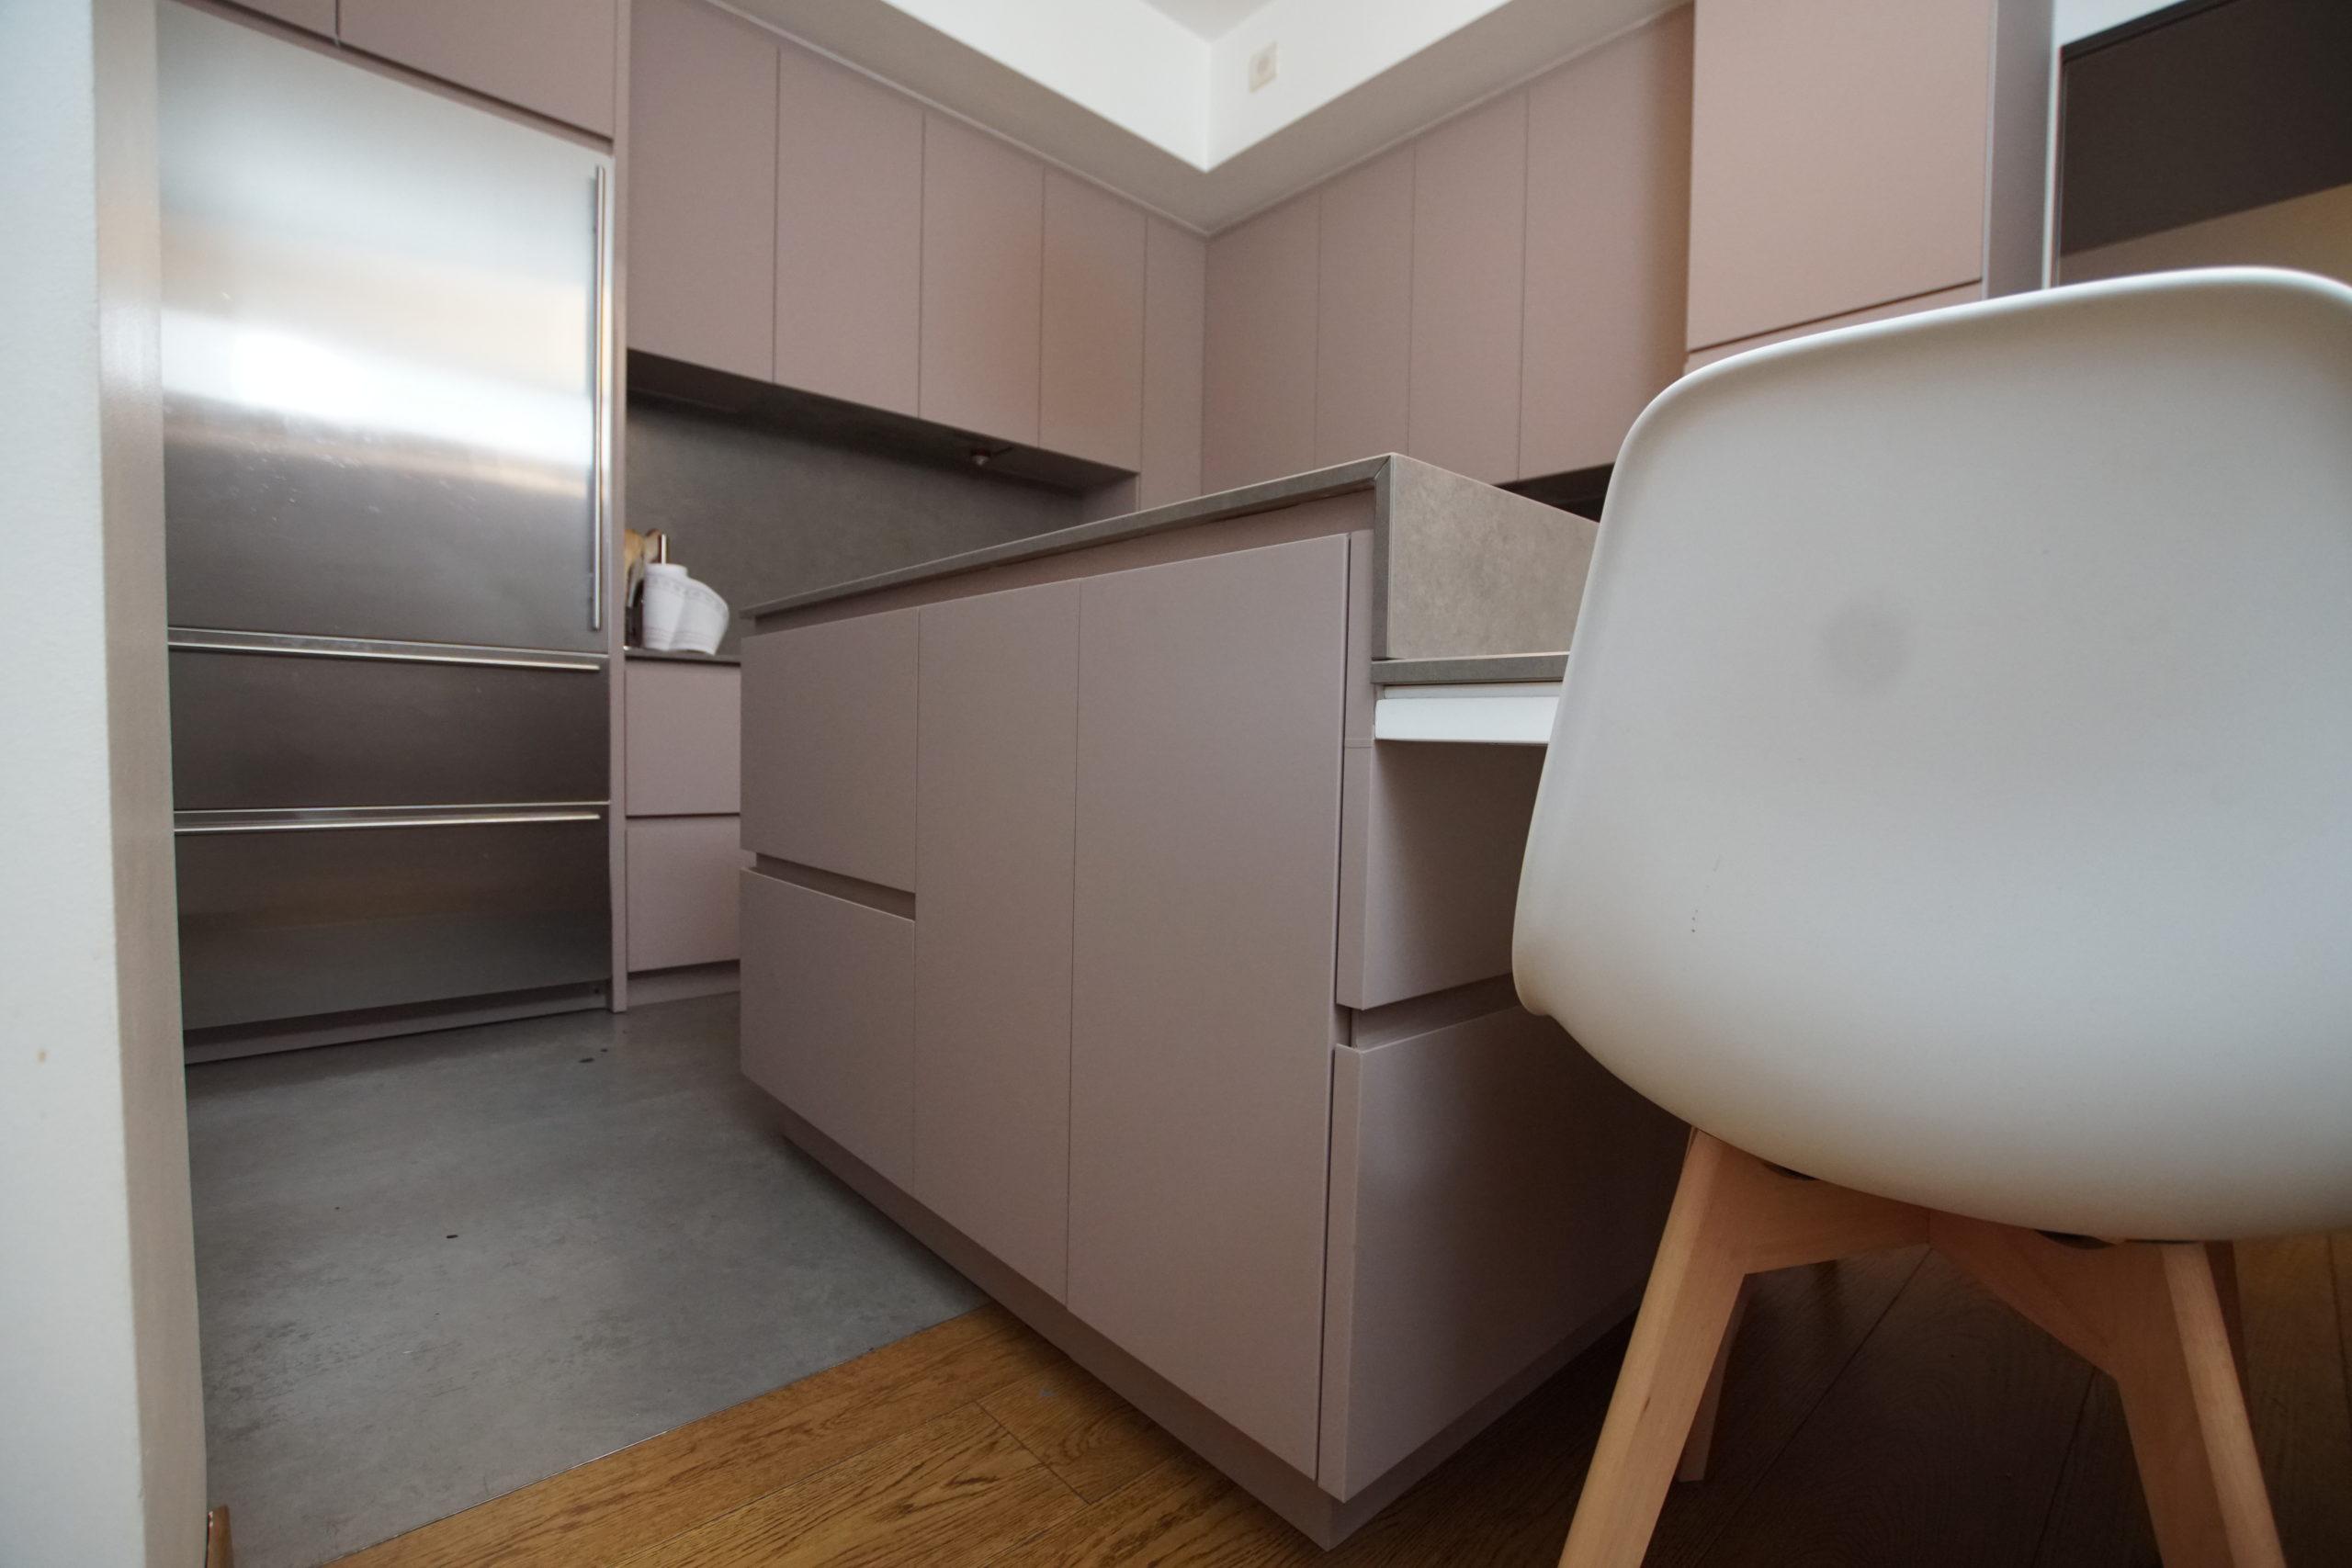 Rinnovo cucina Via Lamarmora – Milano